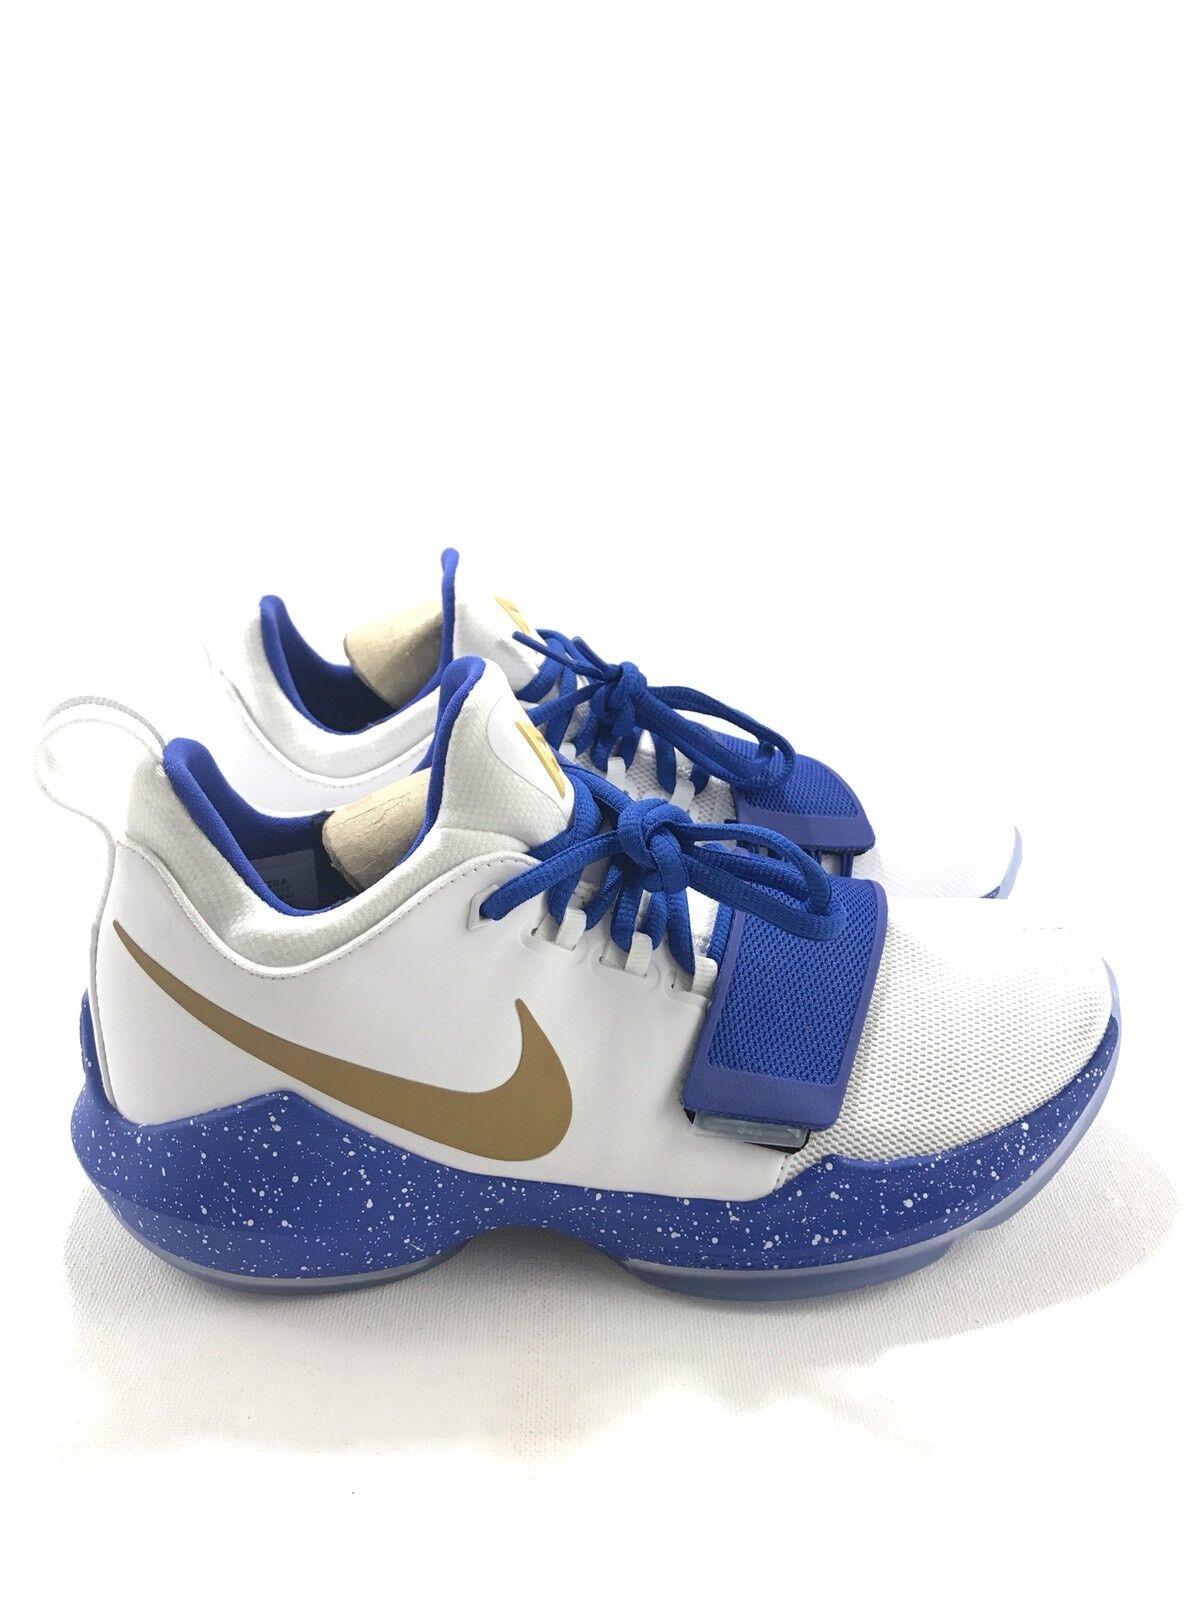 Nike Mens ID PG 1 Size 7 White Royal bluee gold AQ2790-992 Basketball shoes